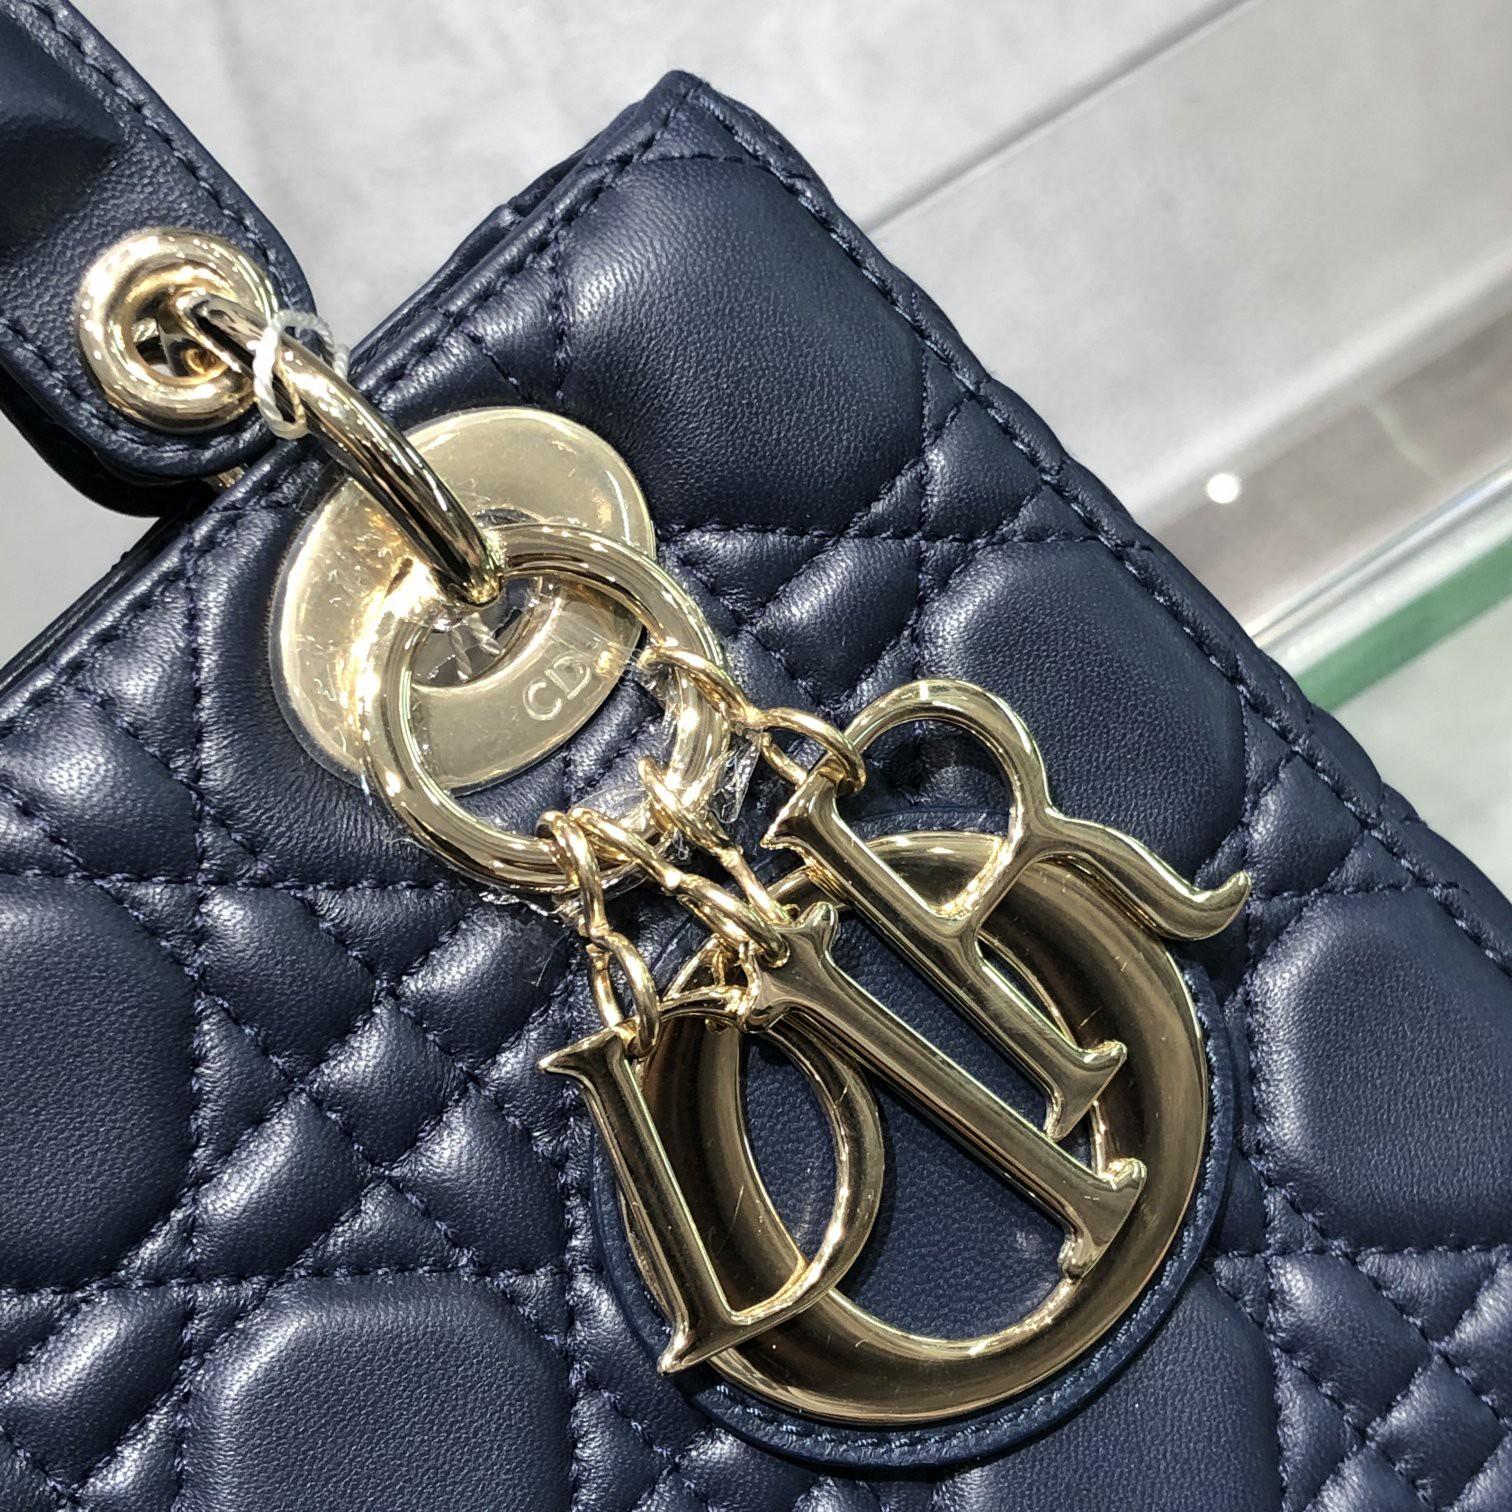 Dior 迪奥 Lady 四格 羊皮 海军蓝 金扣 经典百搭的颜色 实物很美 20cm 搭配徽章款宽肩带